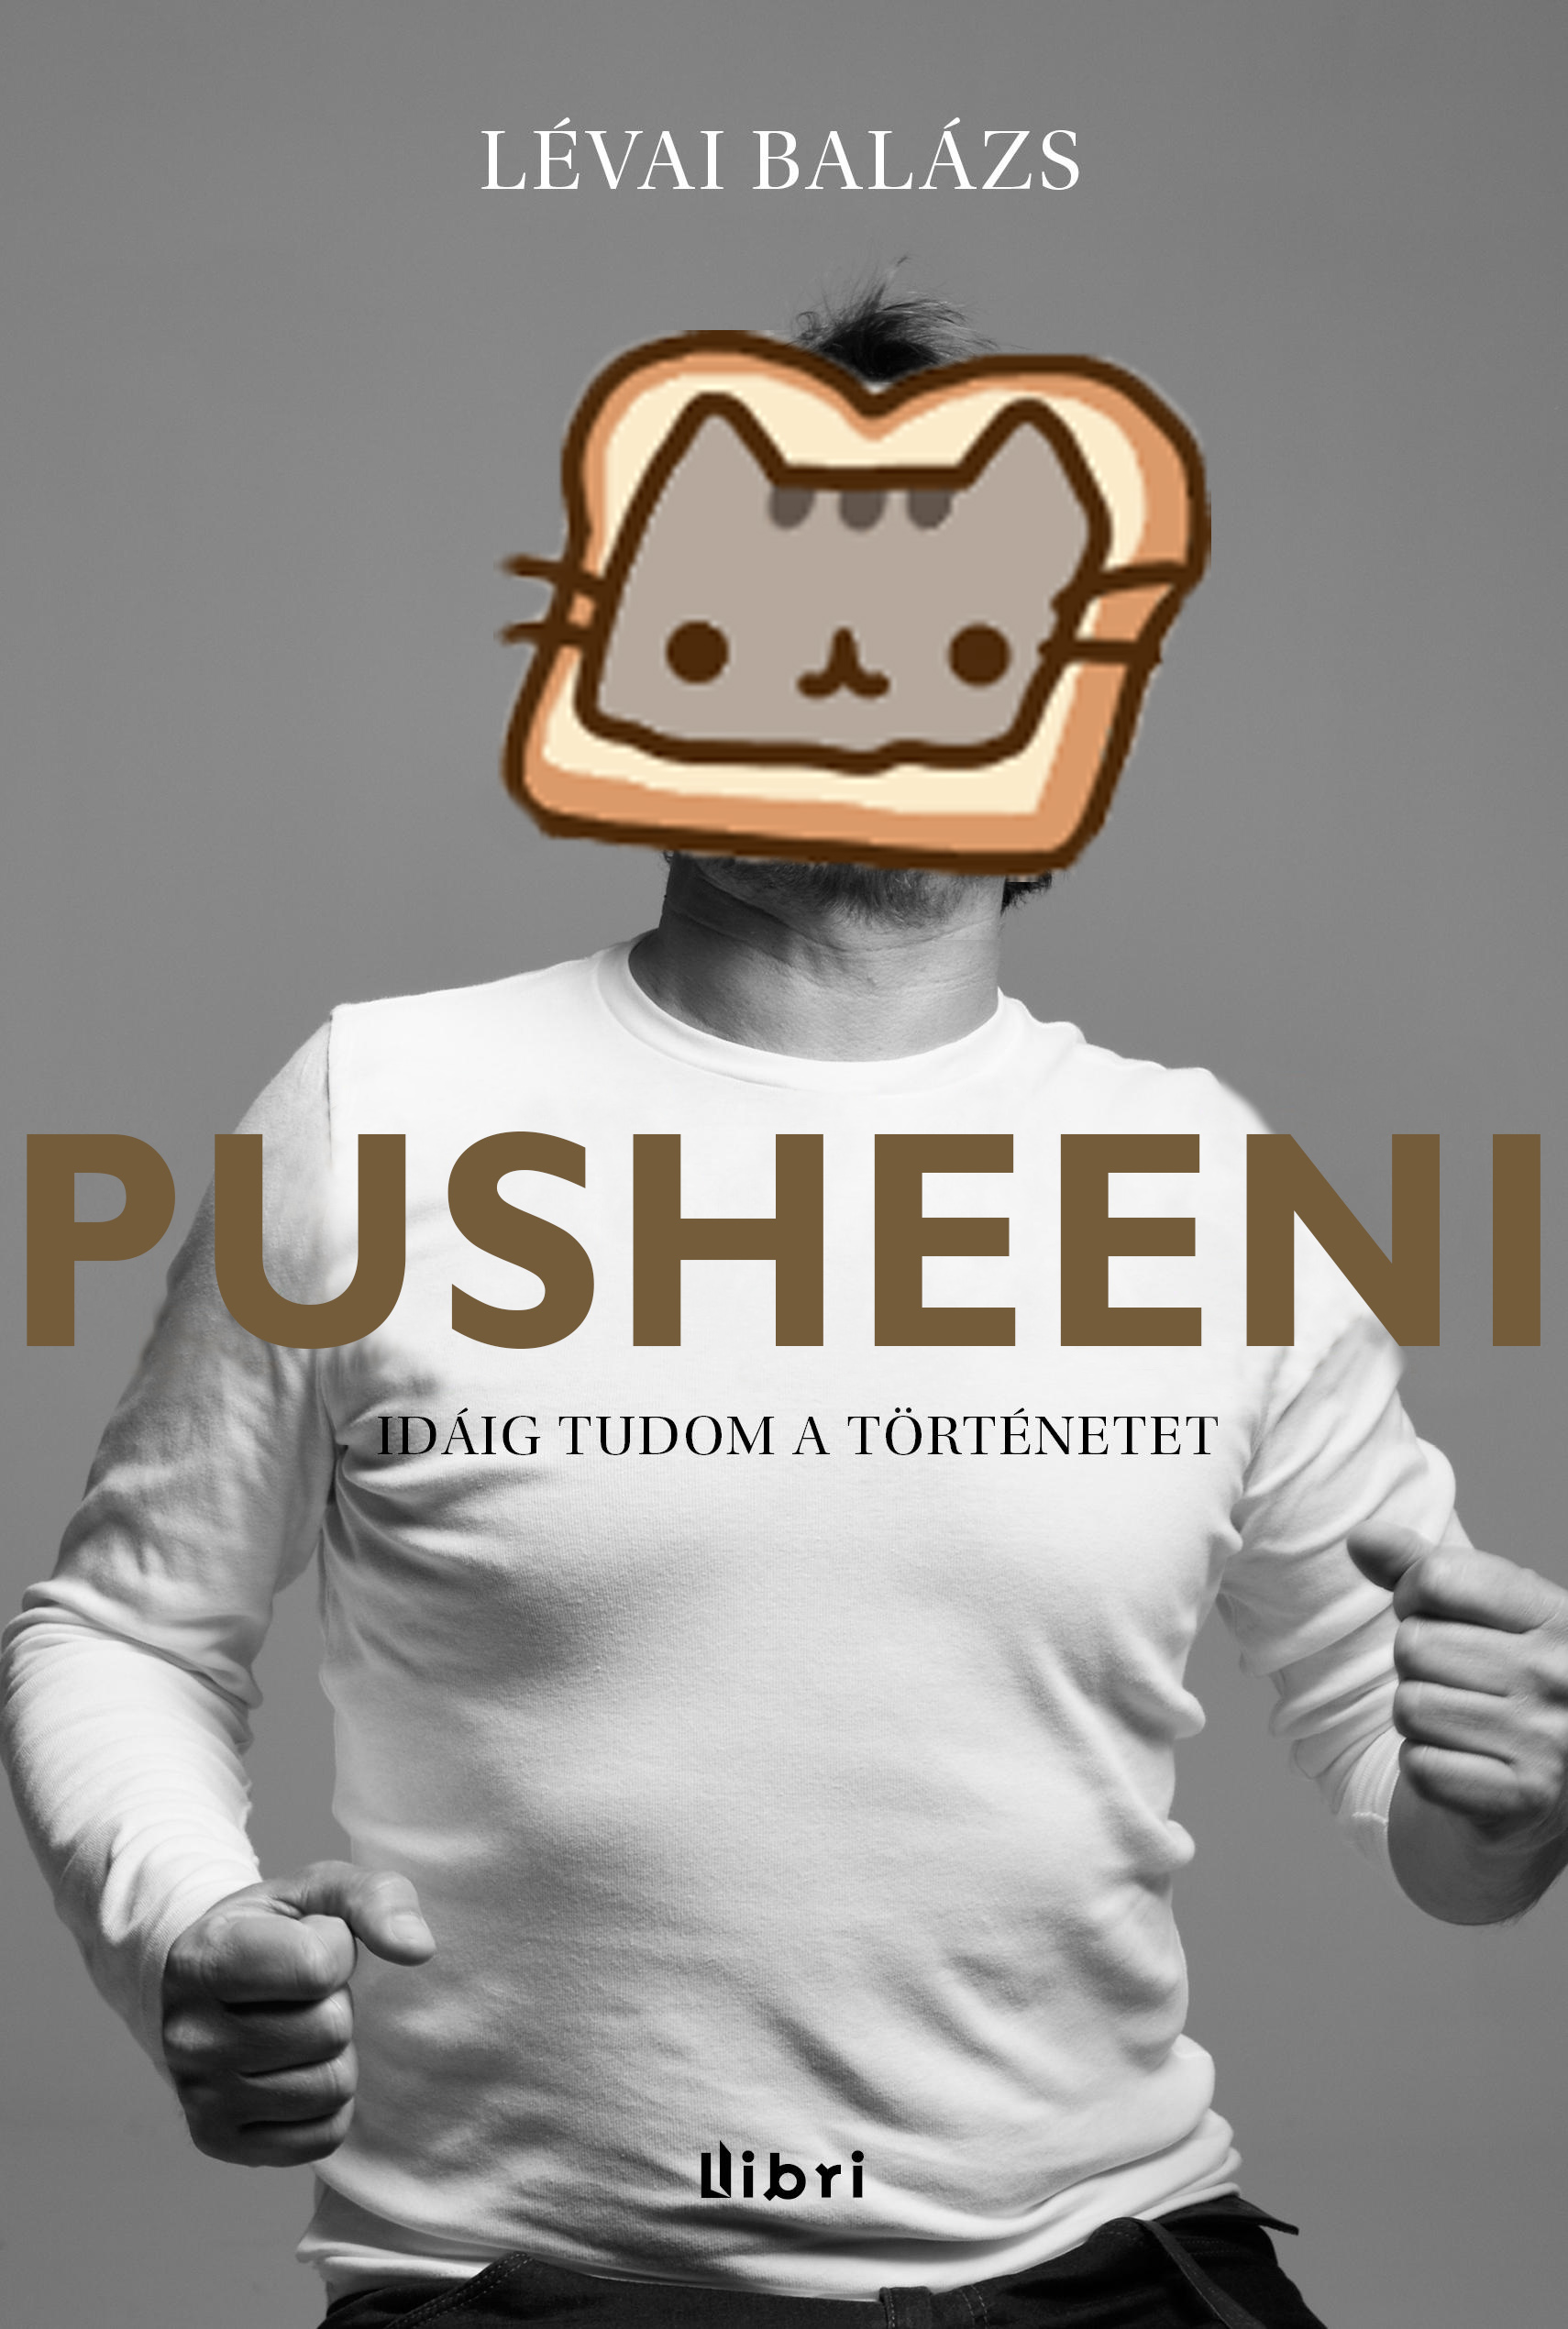 31 KULT Pusheeni